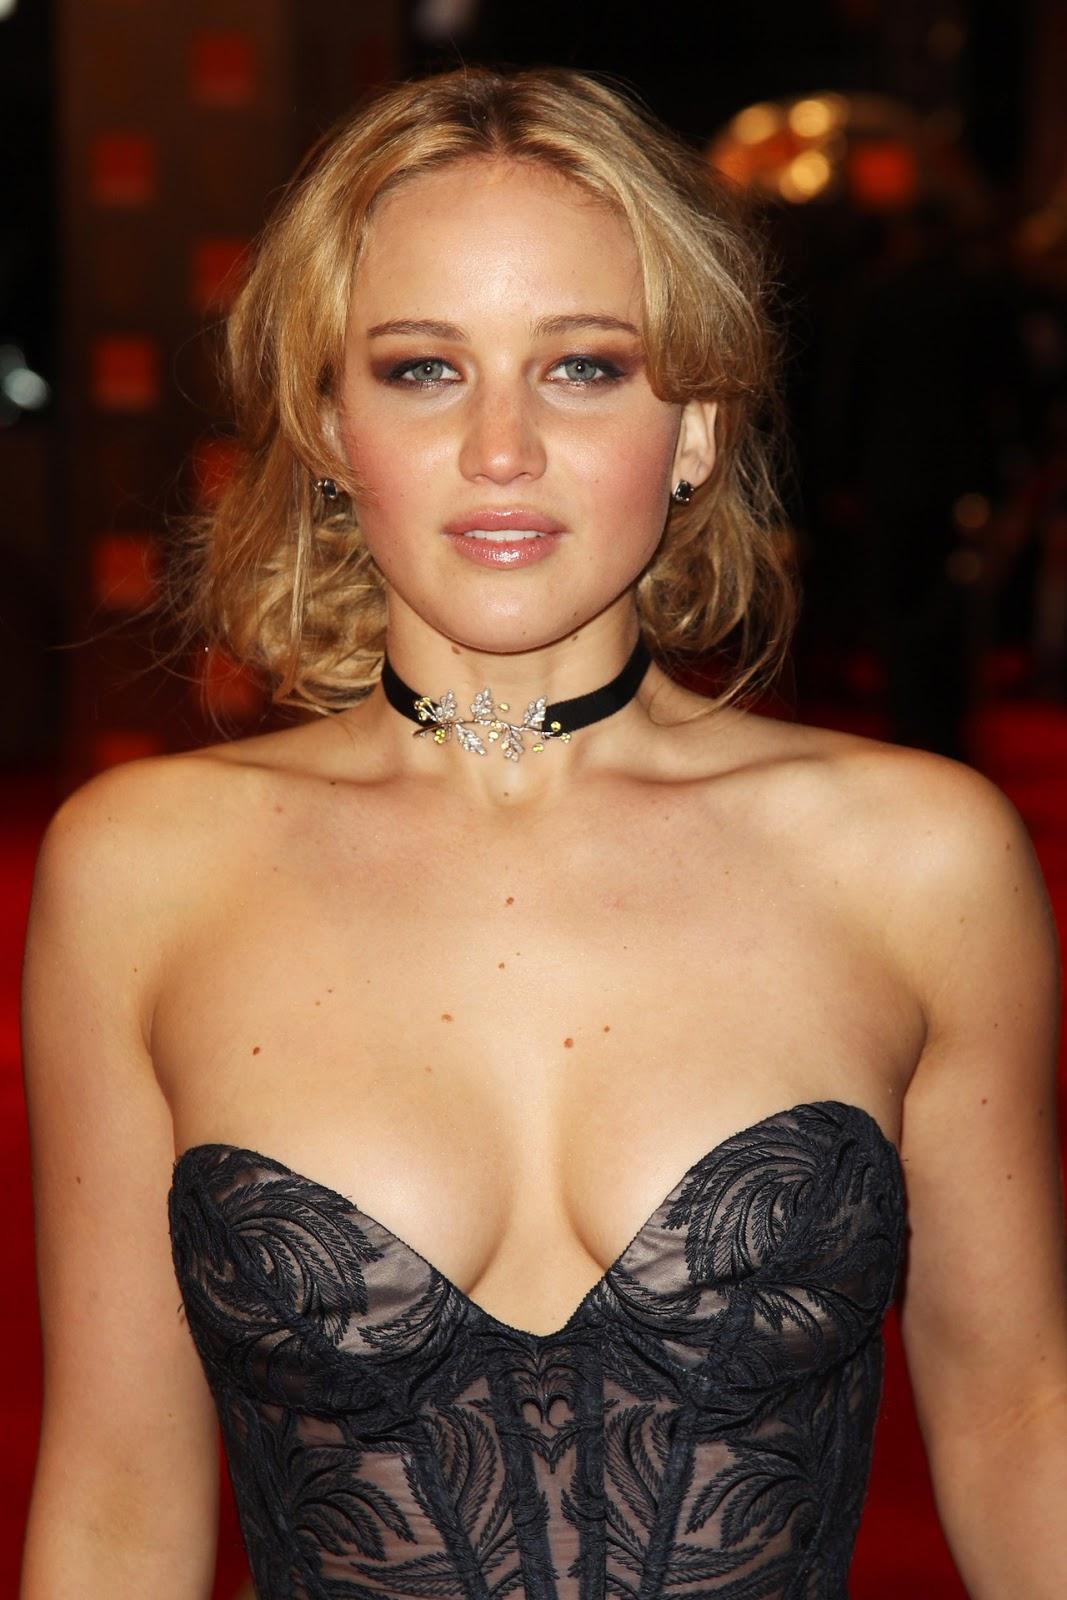 Jennifer-Lawrence-067.jpg